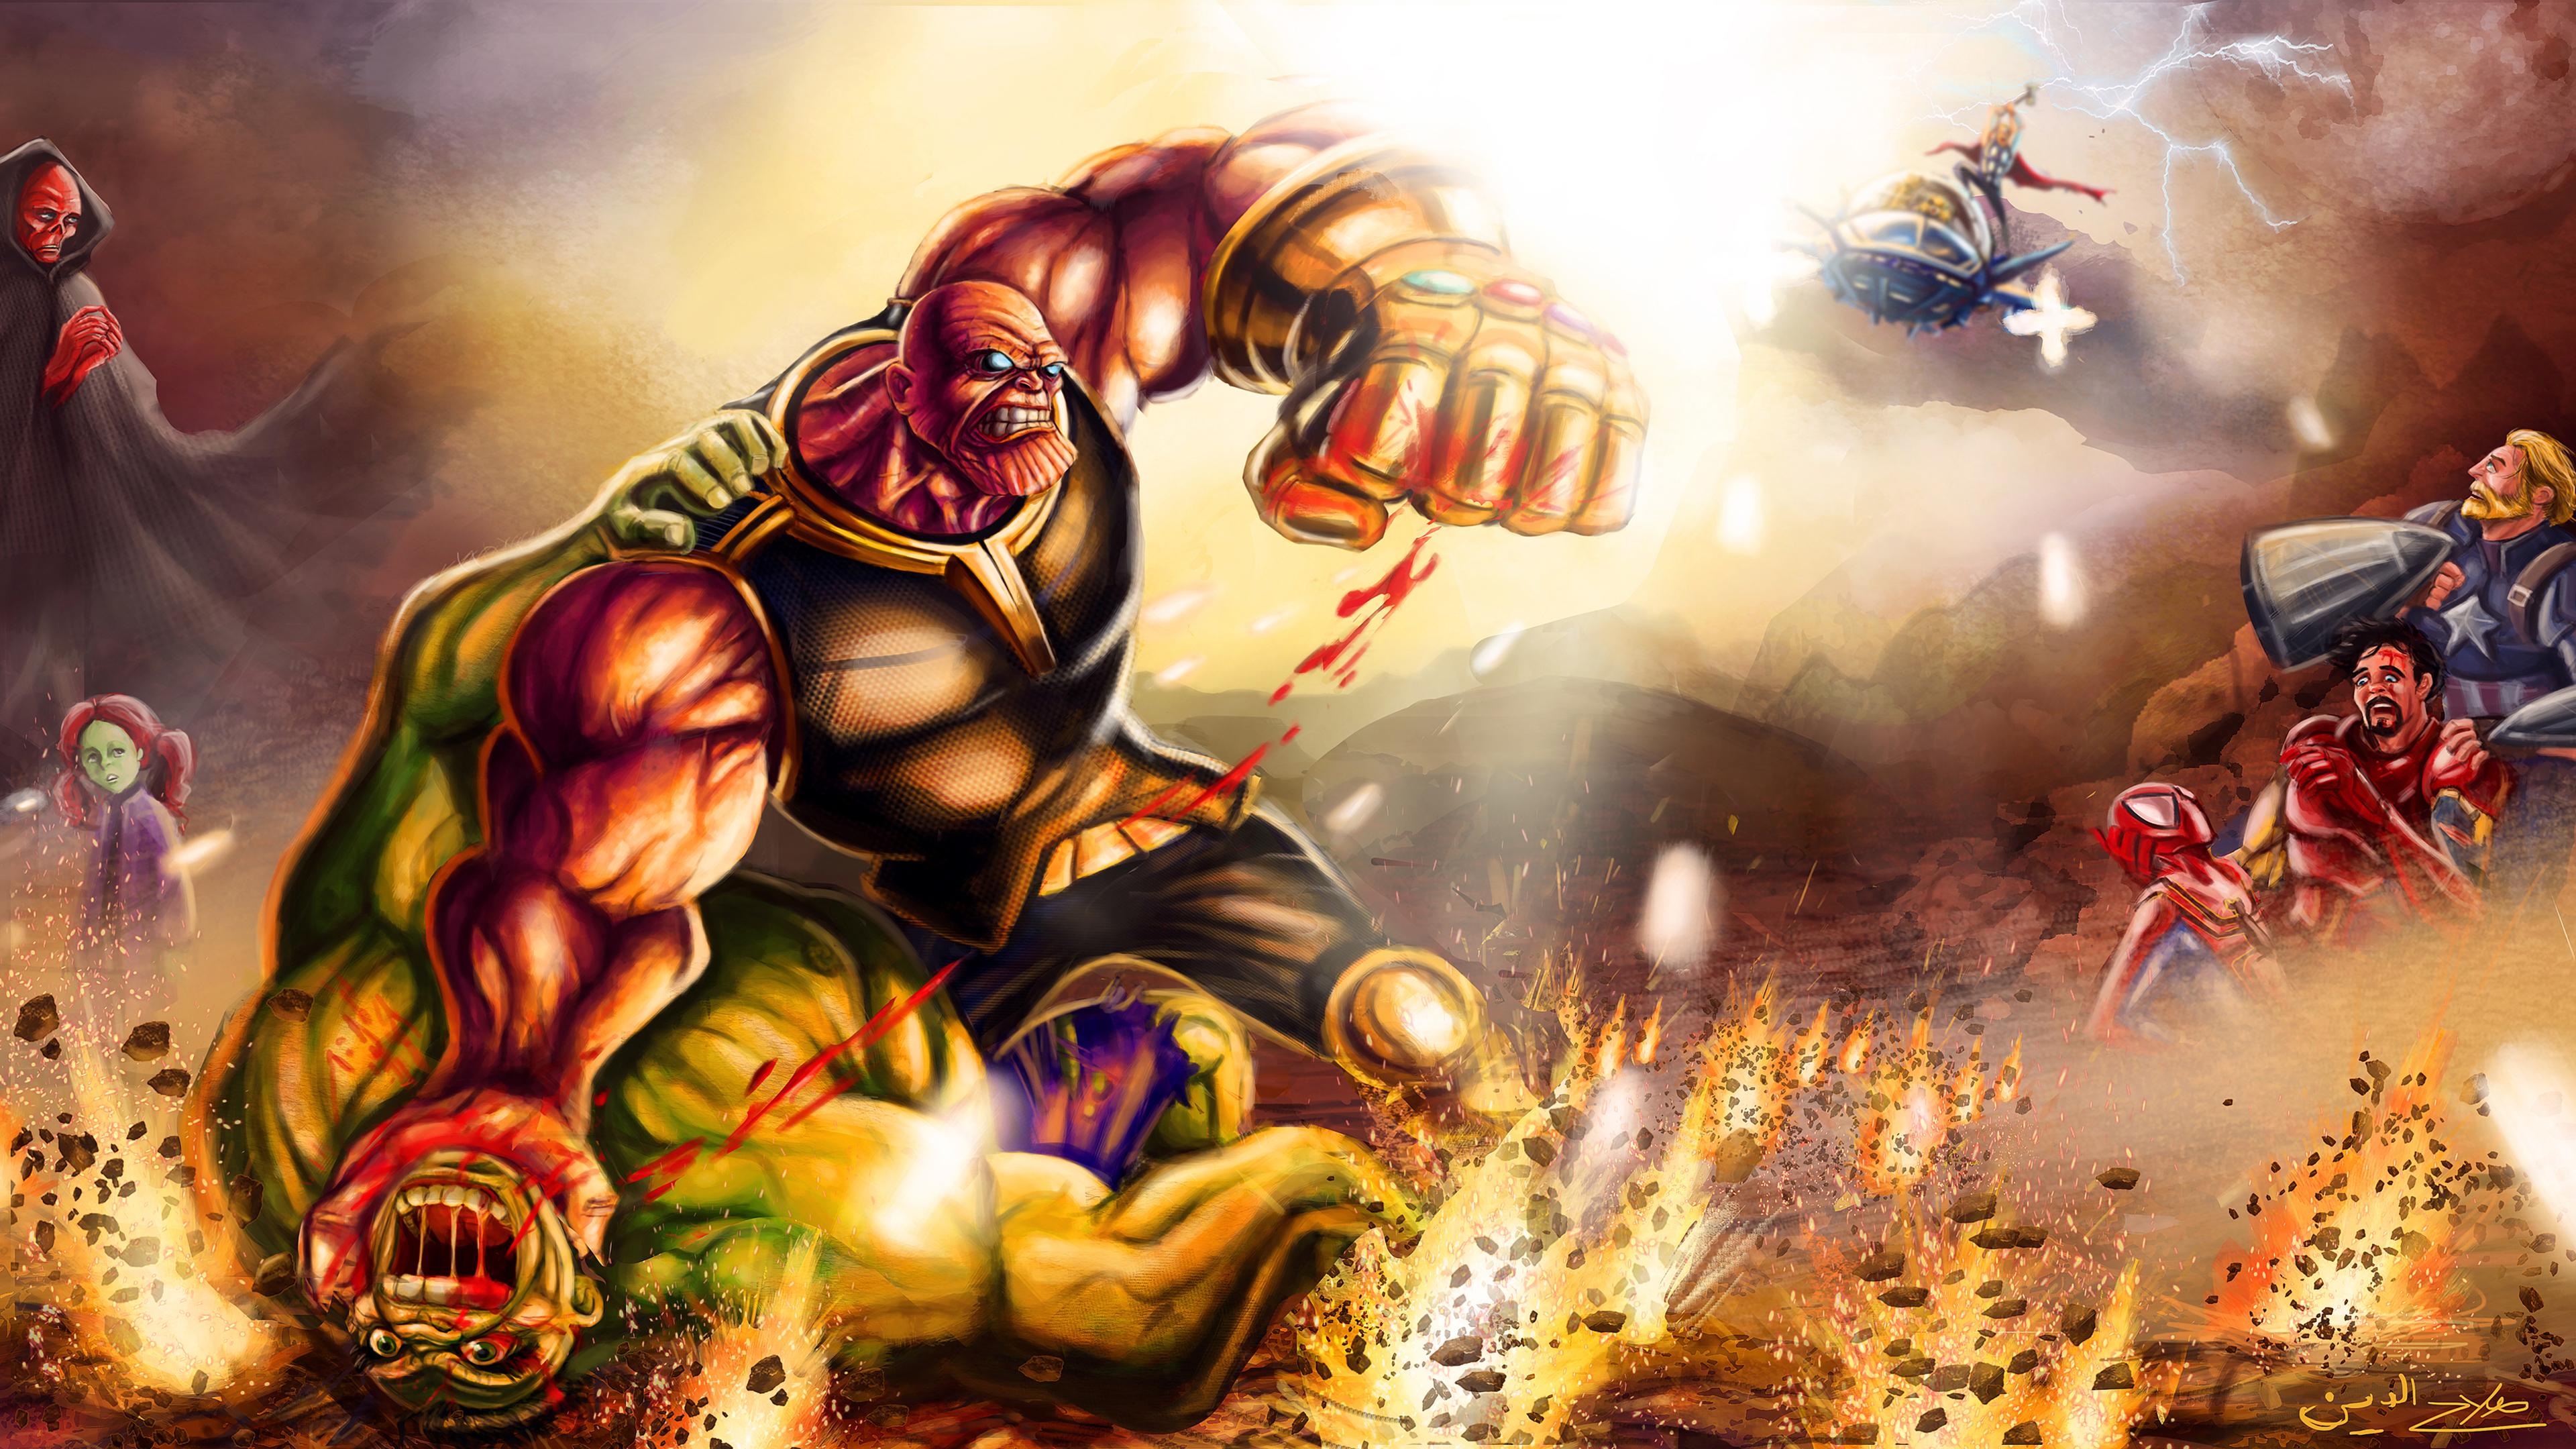 thanos defeat hulk 1539452788 - Thanos Defeat Hulk - thanos-wallpapers, superheroes wallpapers, hulk wallpapers, hd-wallpapers, behance wallpapers, artwork wallpapers, artist wallpapers, 4k-wallpapers